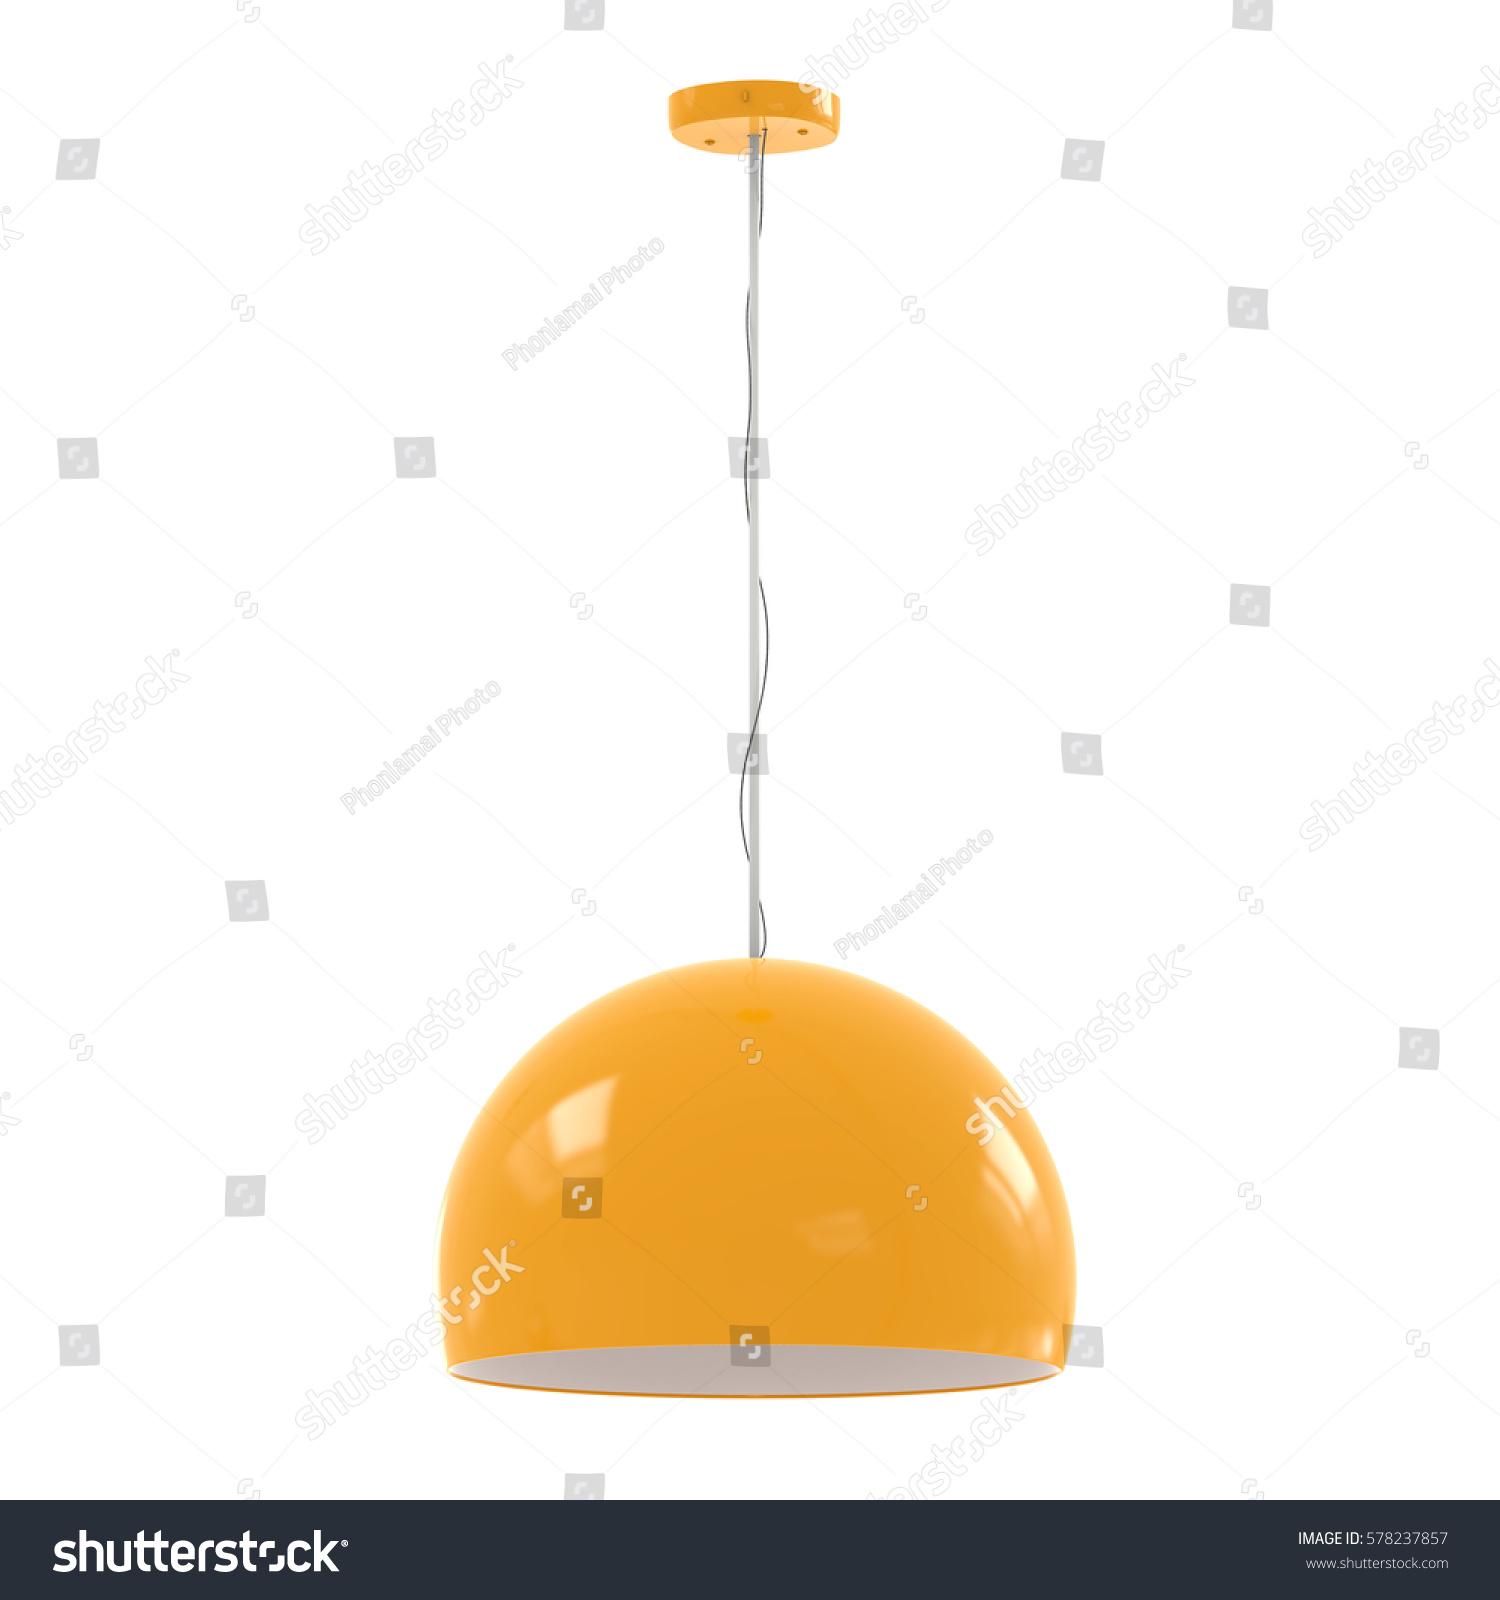 yellow pendant lighting. 3 D Rendering Hanging Yellow Pendant Lamp Stock Illustration 578237857 - Shutterstock Lighting